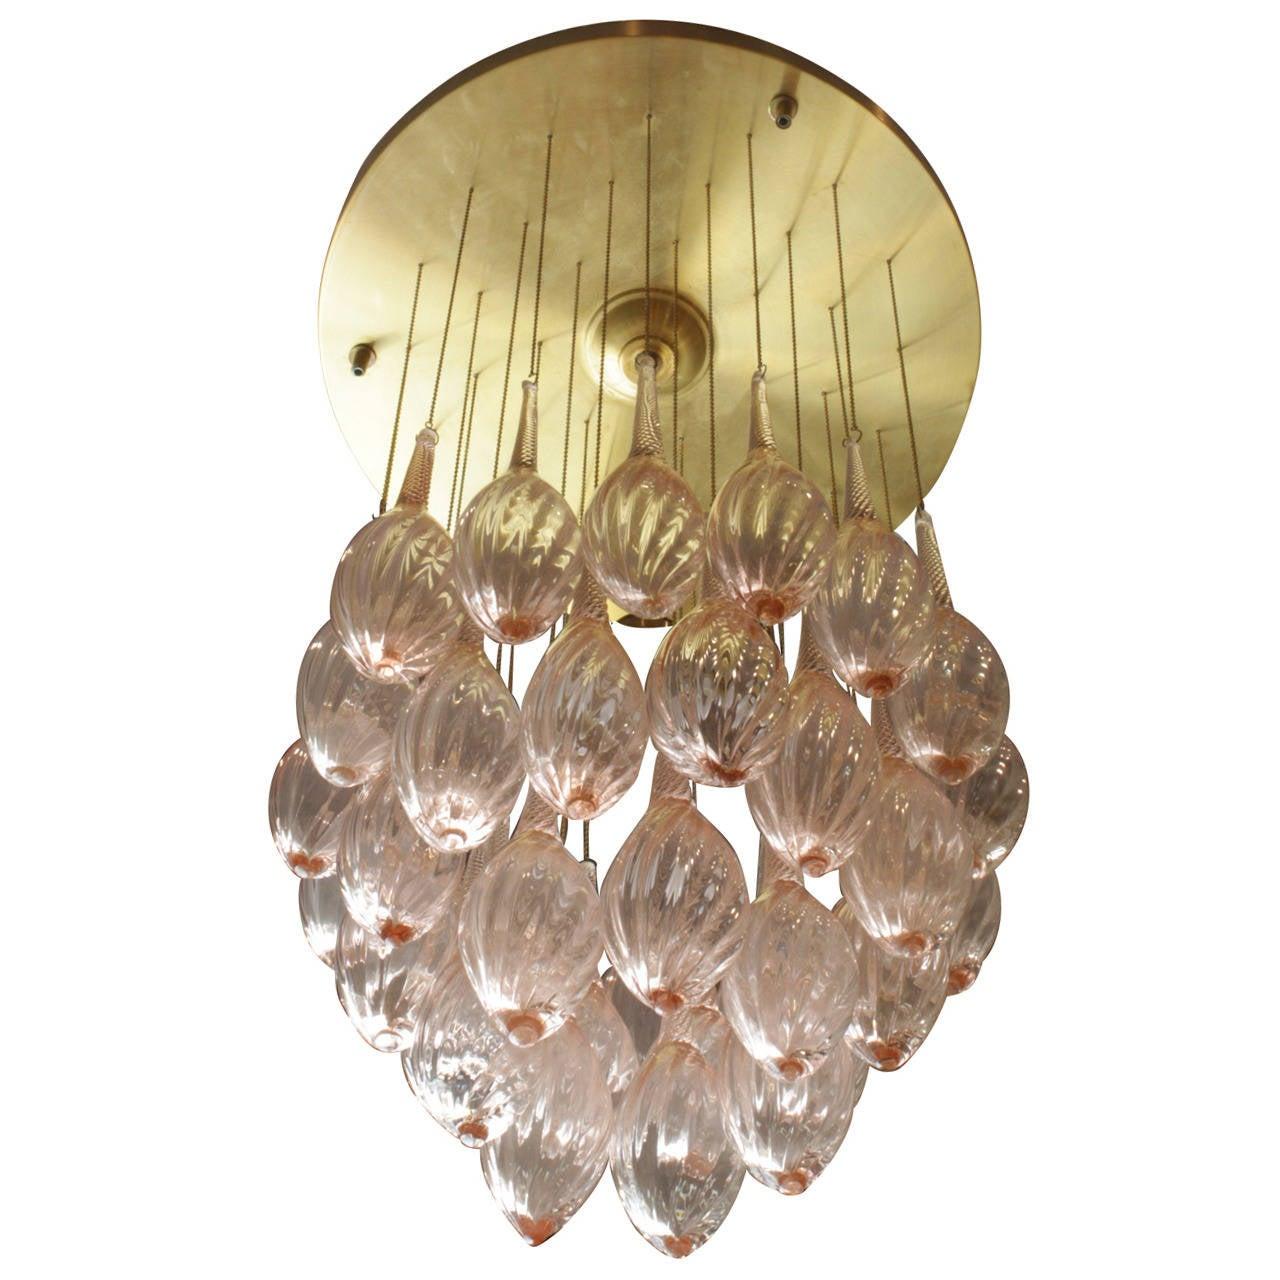 Italian Mid Century Modern Brass And Pink Murano Glass Teardrop Chandelier For